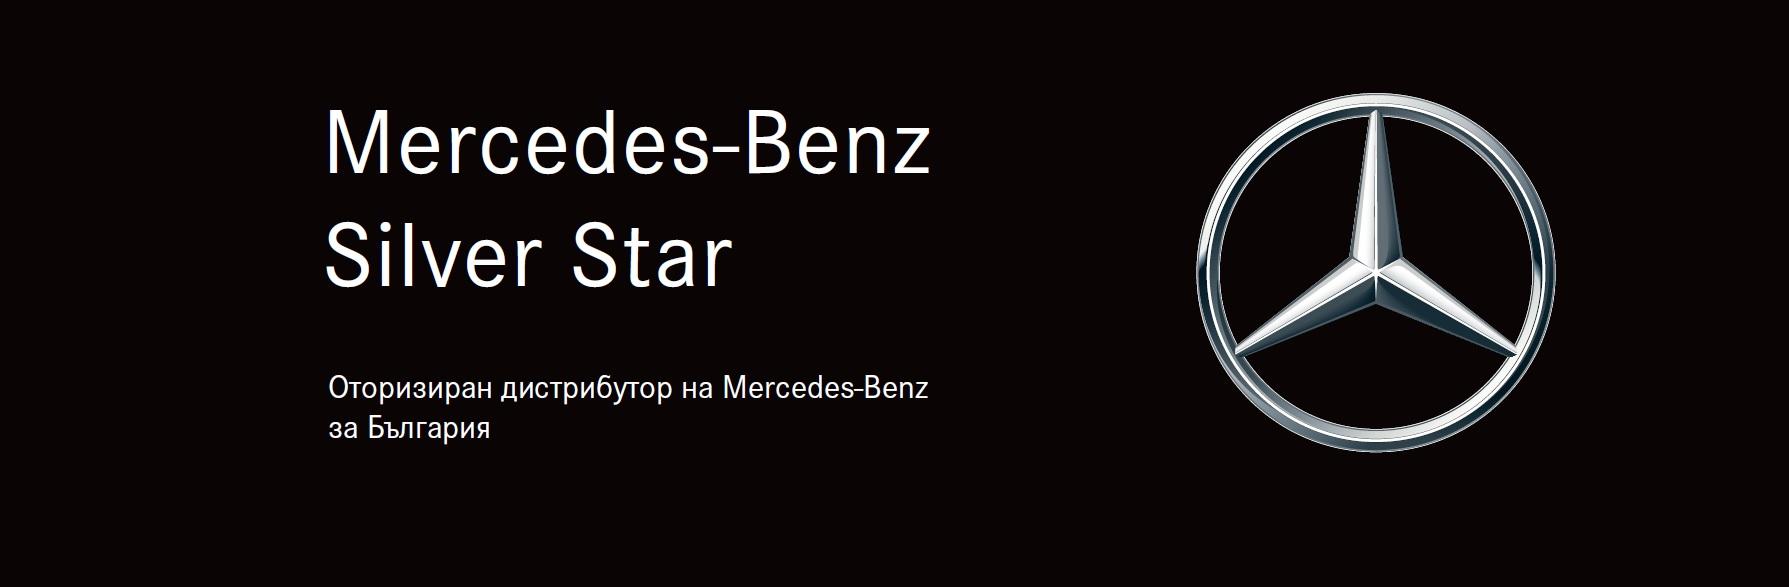 Silver Star Retail